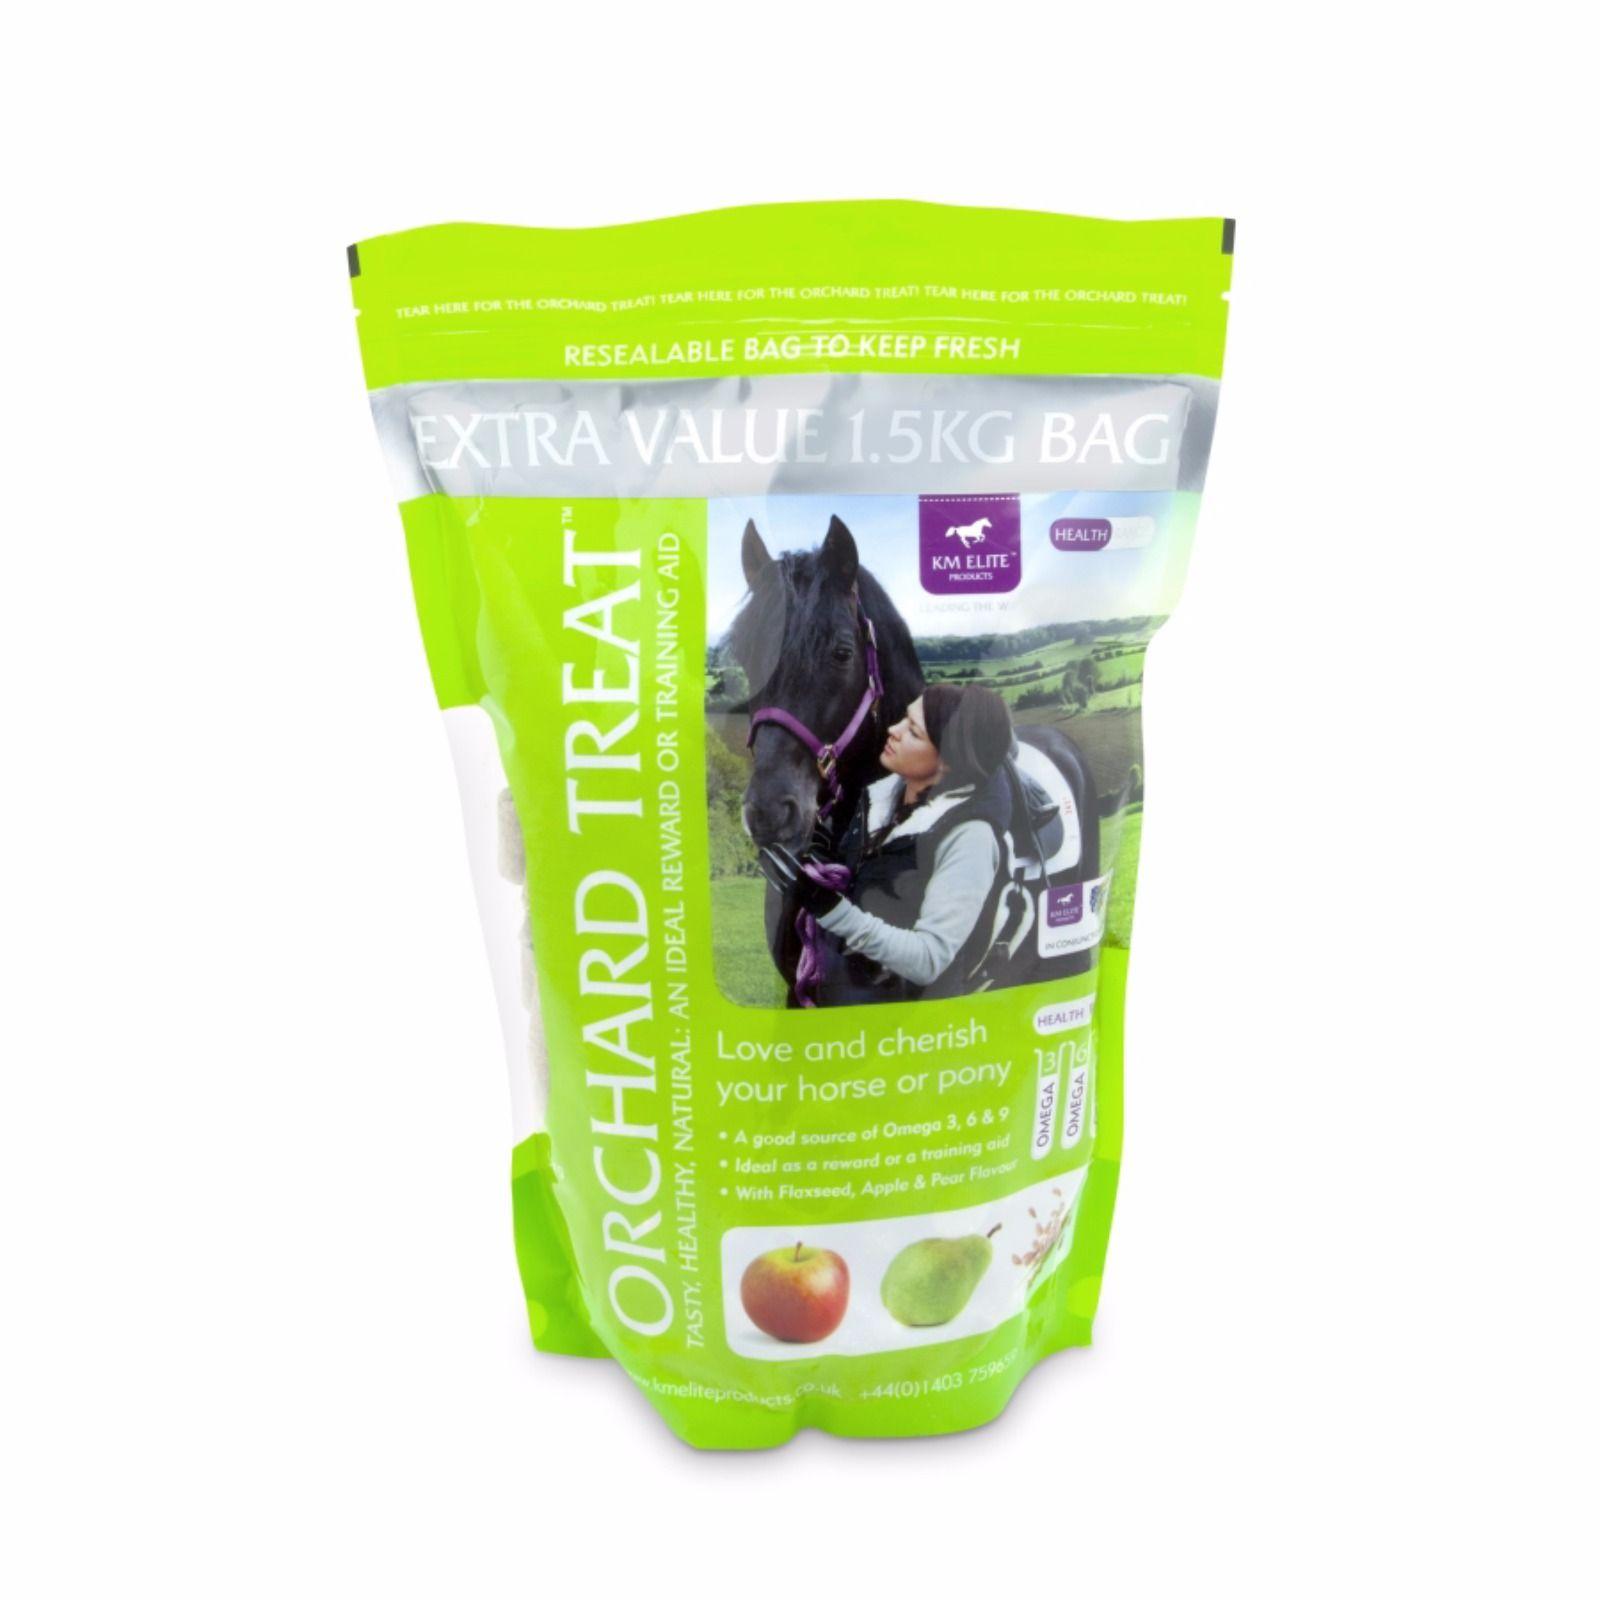 KM Elite Orchard Treats 1.5 kg